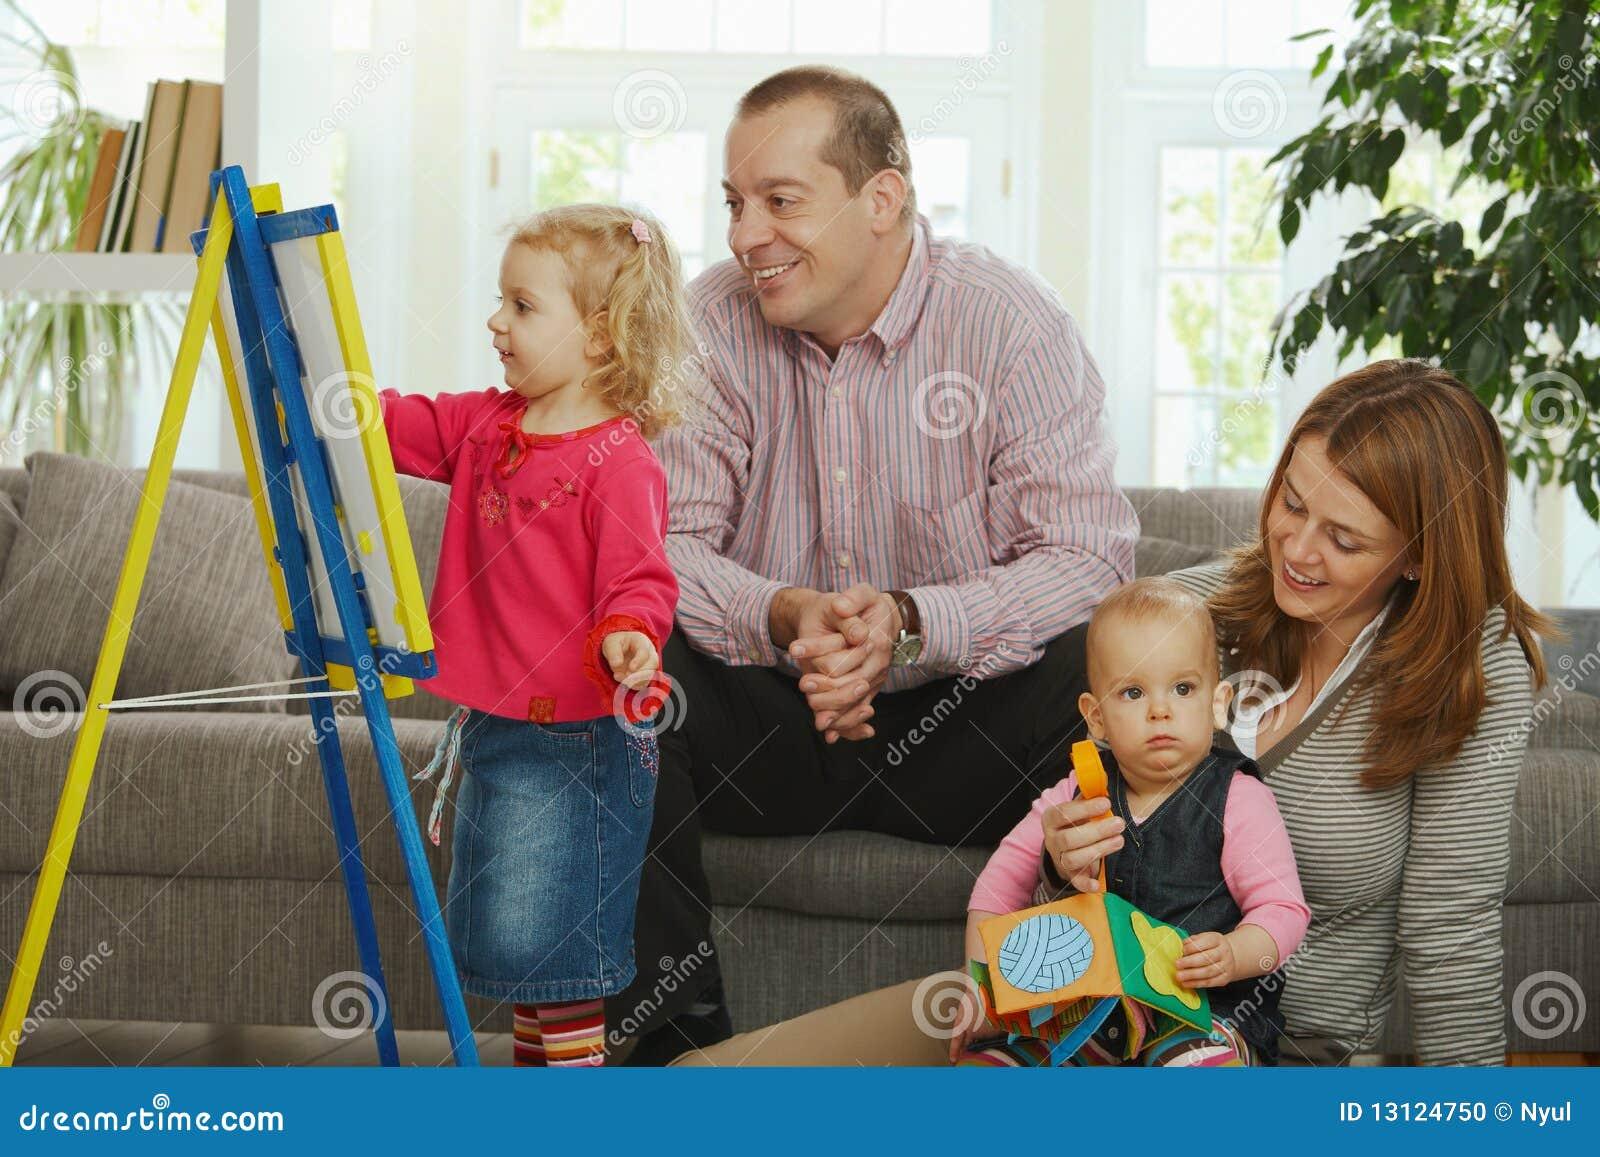 Family Fun At Home Stock Photo Image 13124750